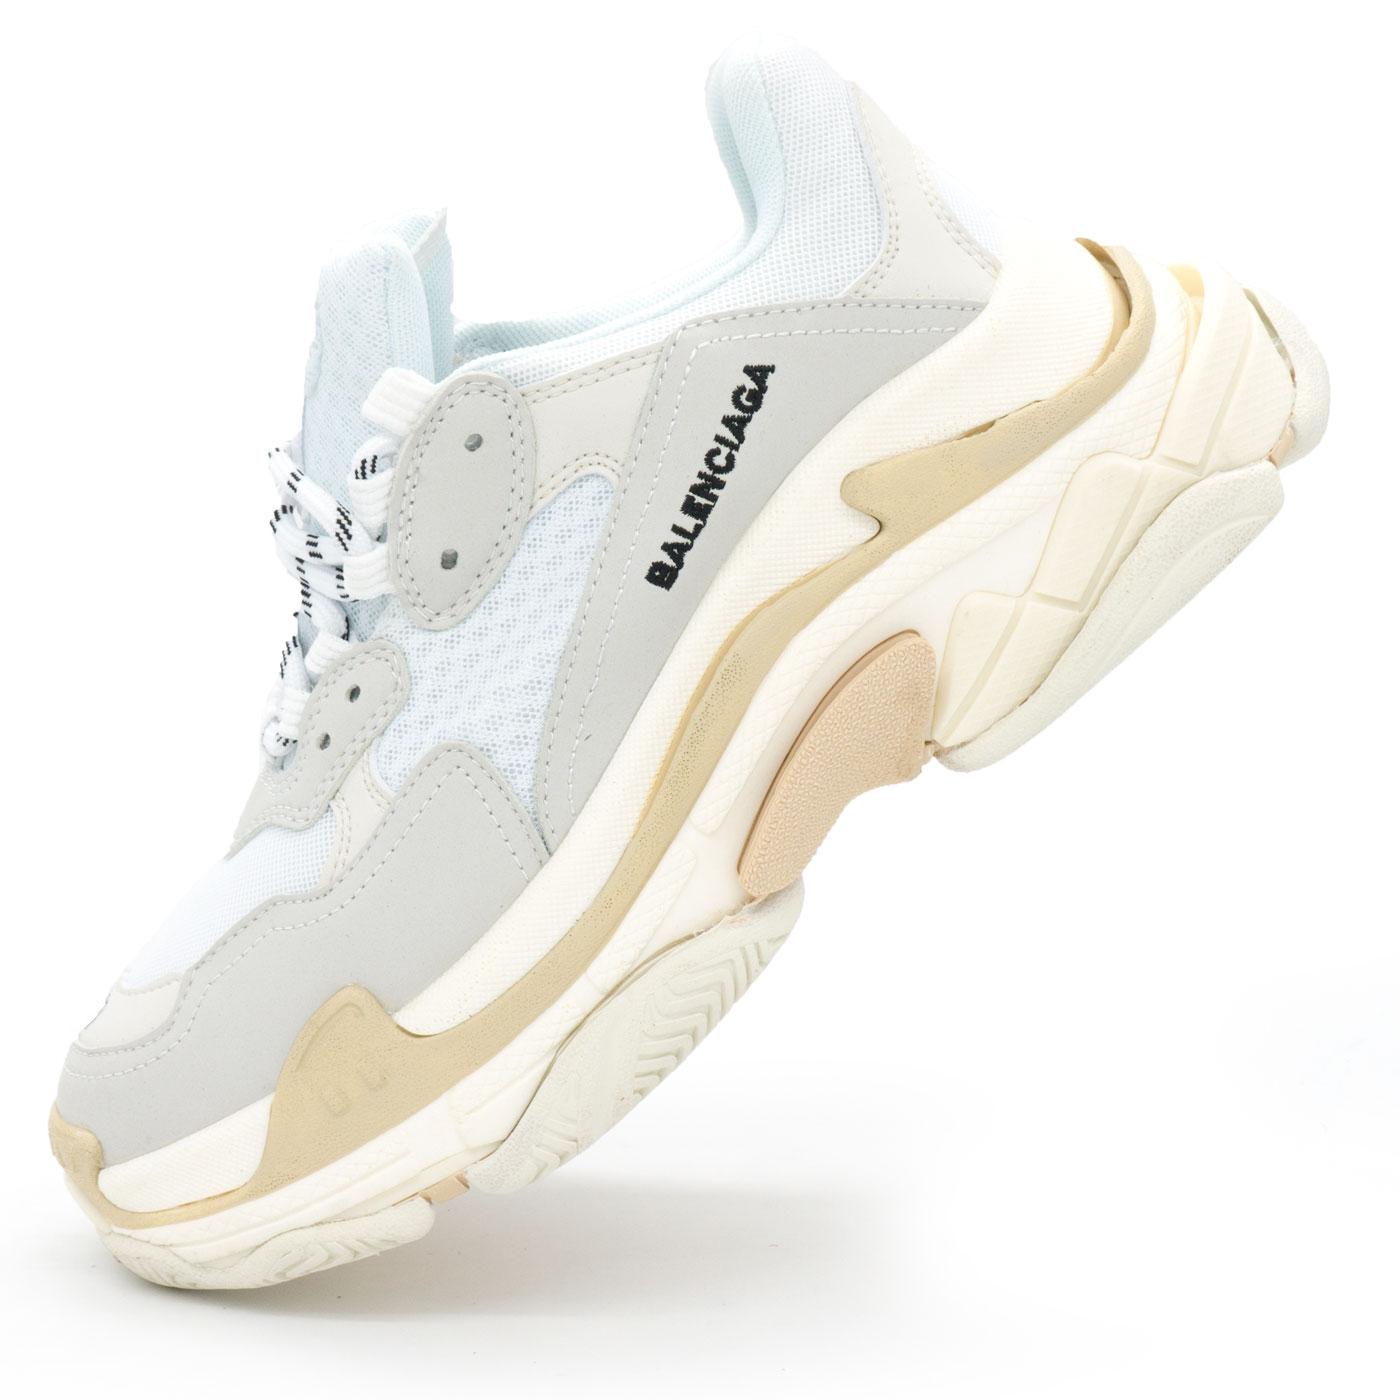 фото main Женские серо белые кроссовки Balenciaga. Топ качество! main